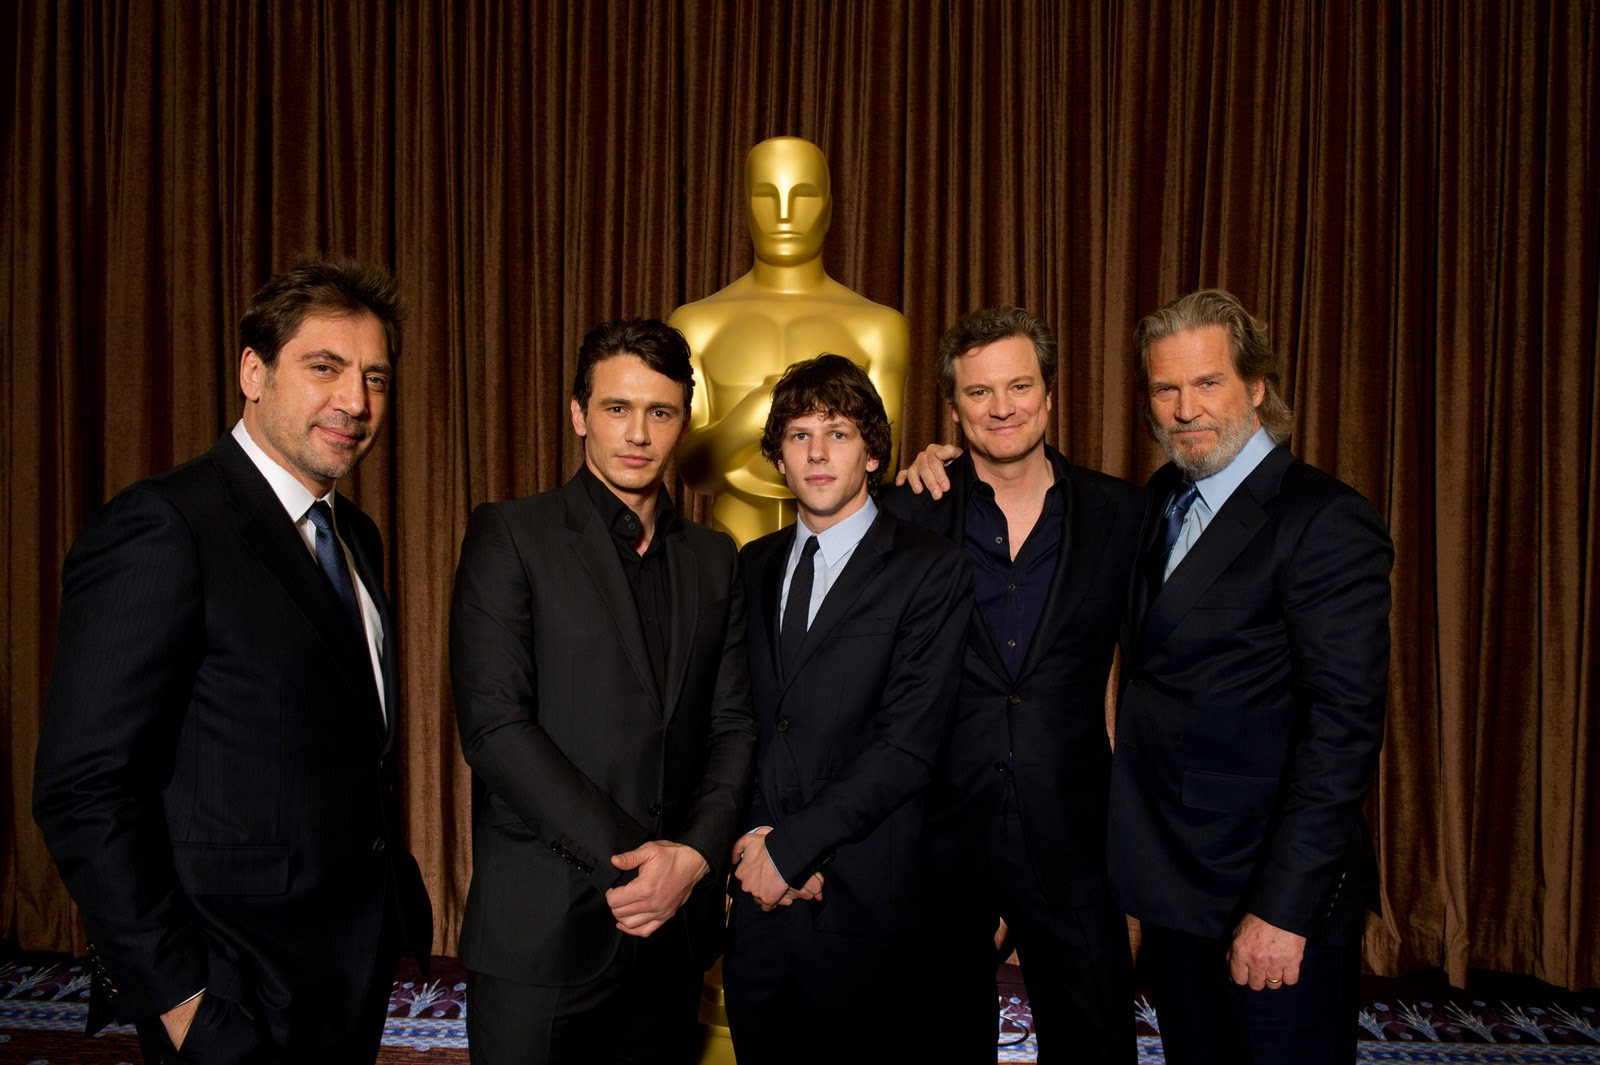 http://3.bp.blogspot.com/-0hgjZRa8pEk/TWfOqFZJKfI/AAAAAAAABRo/KCRcqgizVXg/s1600/Ready+for+Oscars+2011+03a.jpg